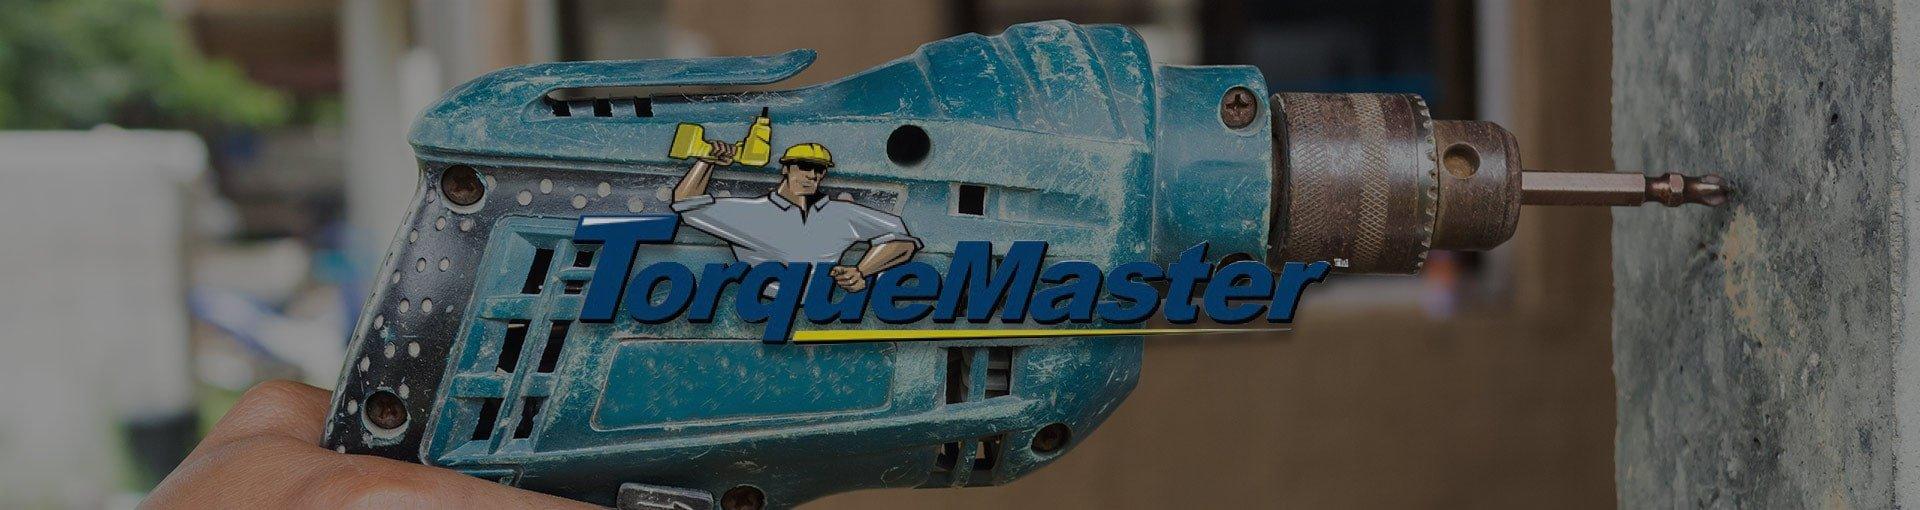 TorqueMaster